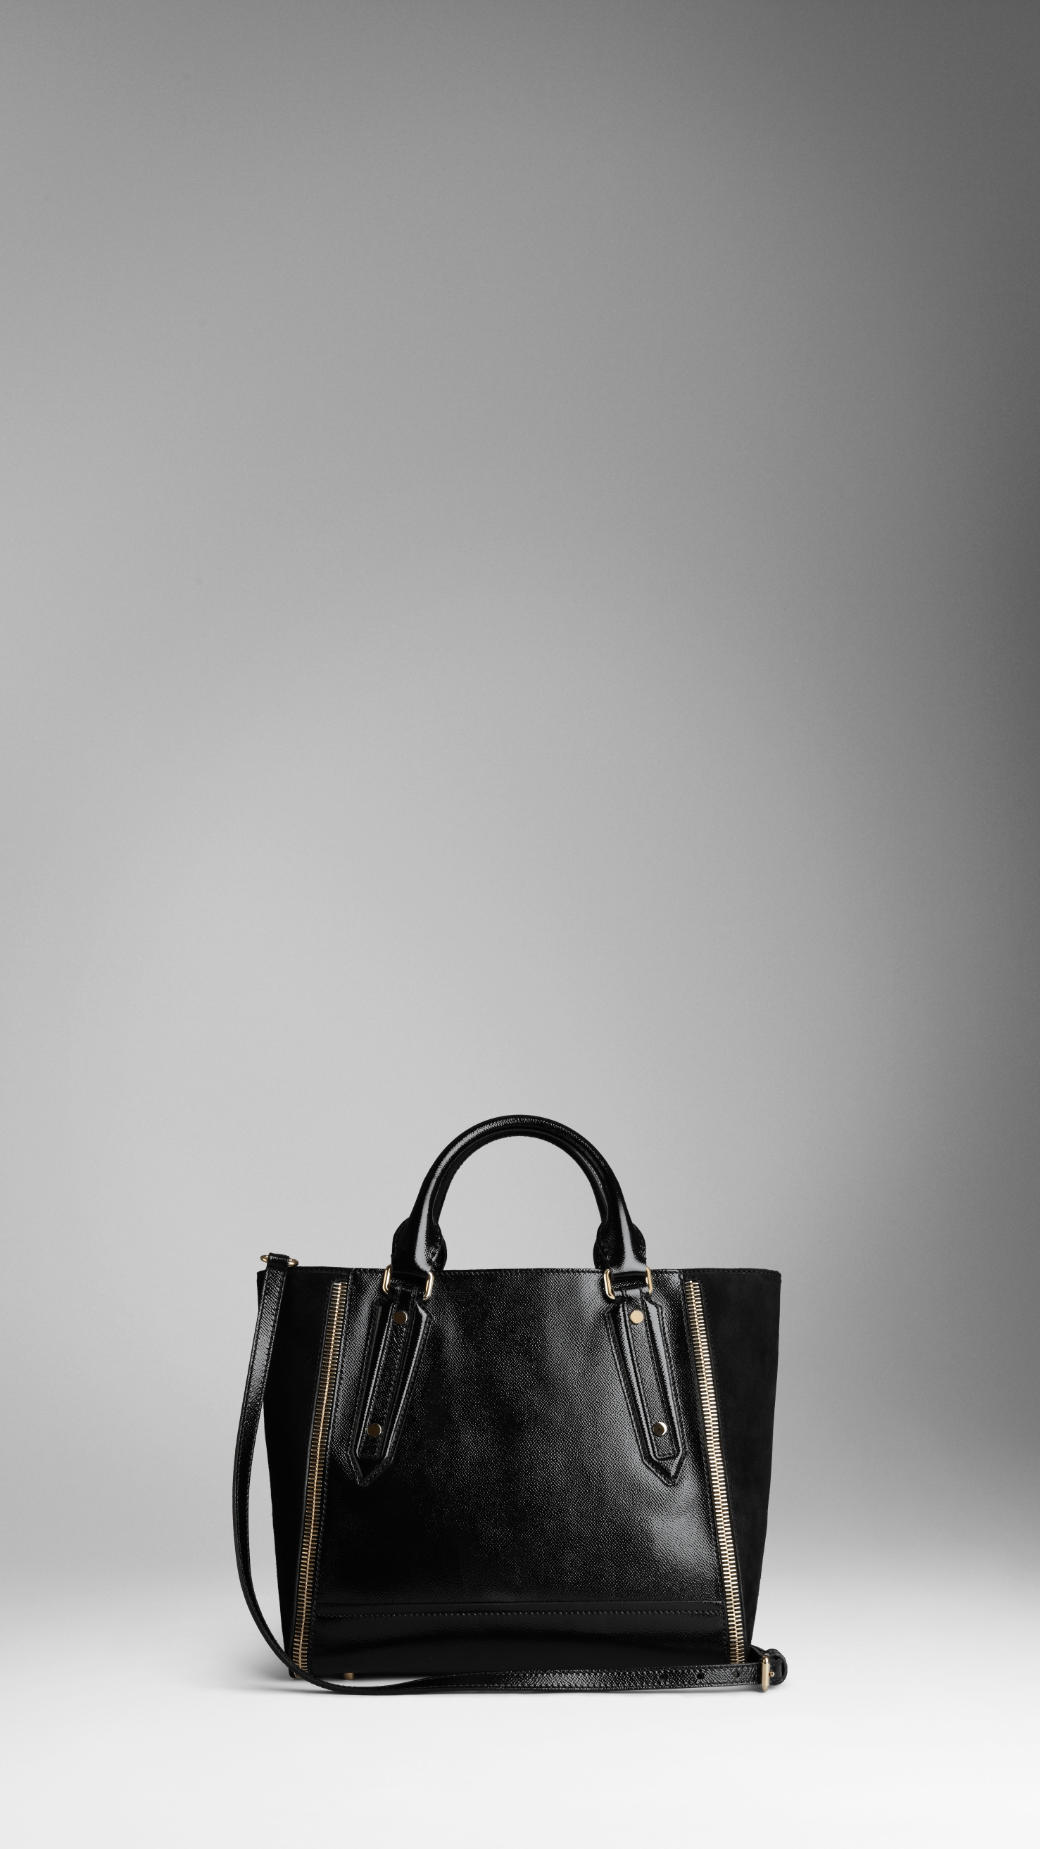 Lyst - Burberry Medium London Leather Zip Detail Tote Bag in Black 1cfdc8bdfc941